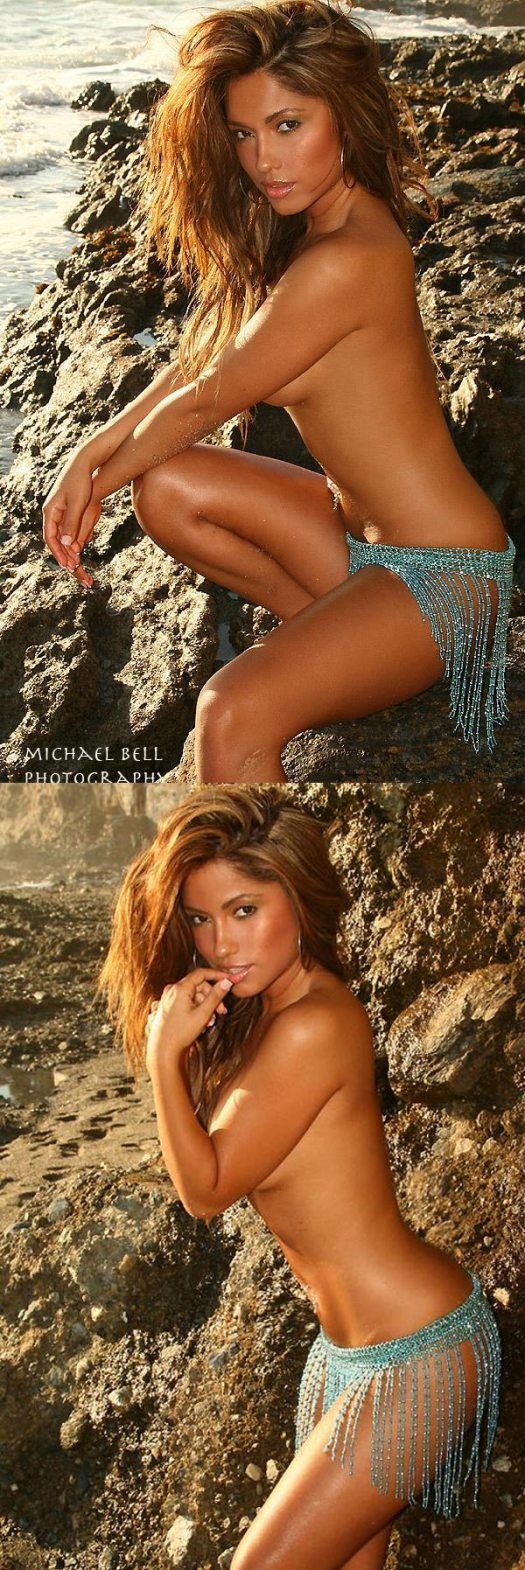 jessica_burciaga-modelindex-dynastyseries_63